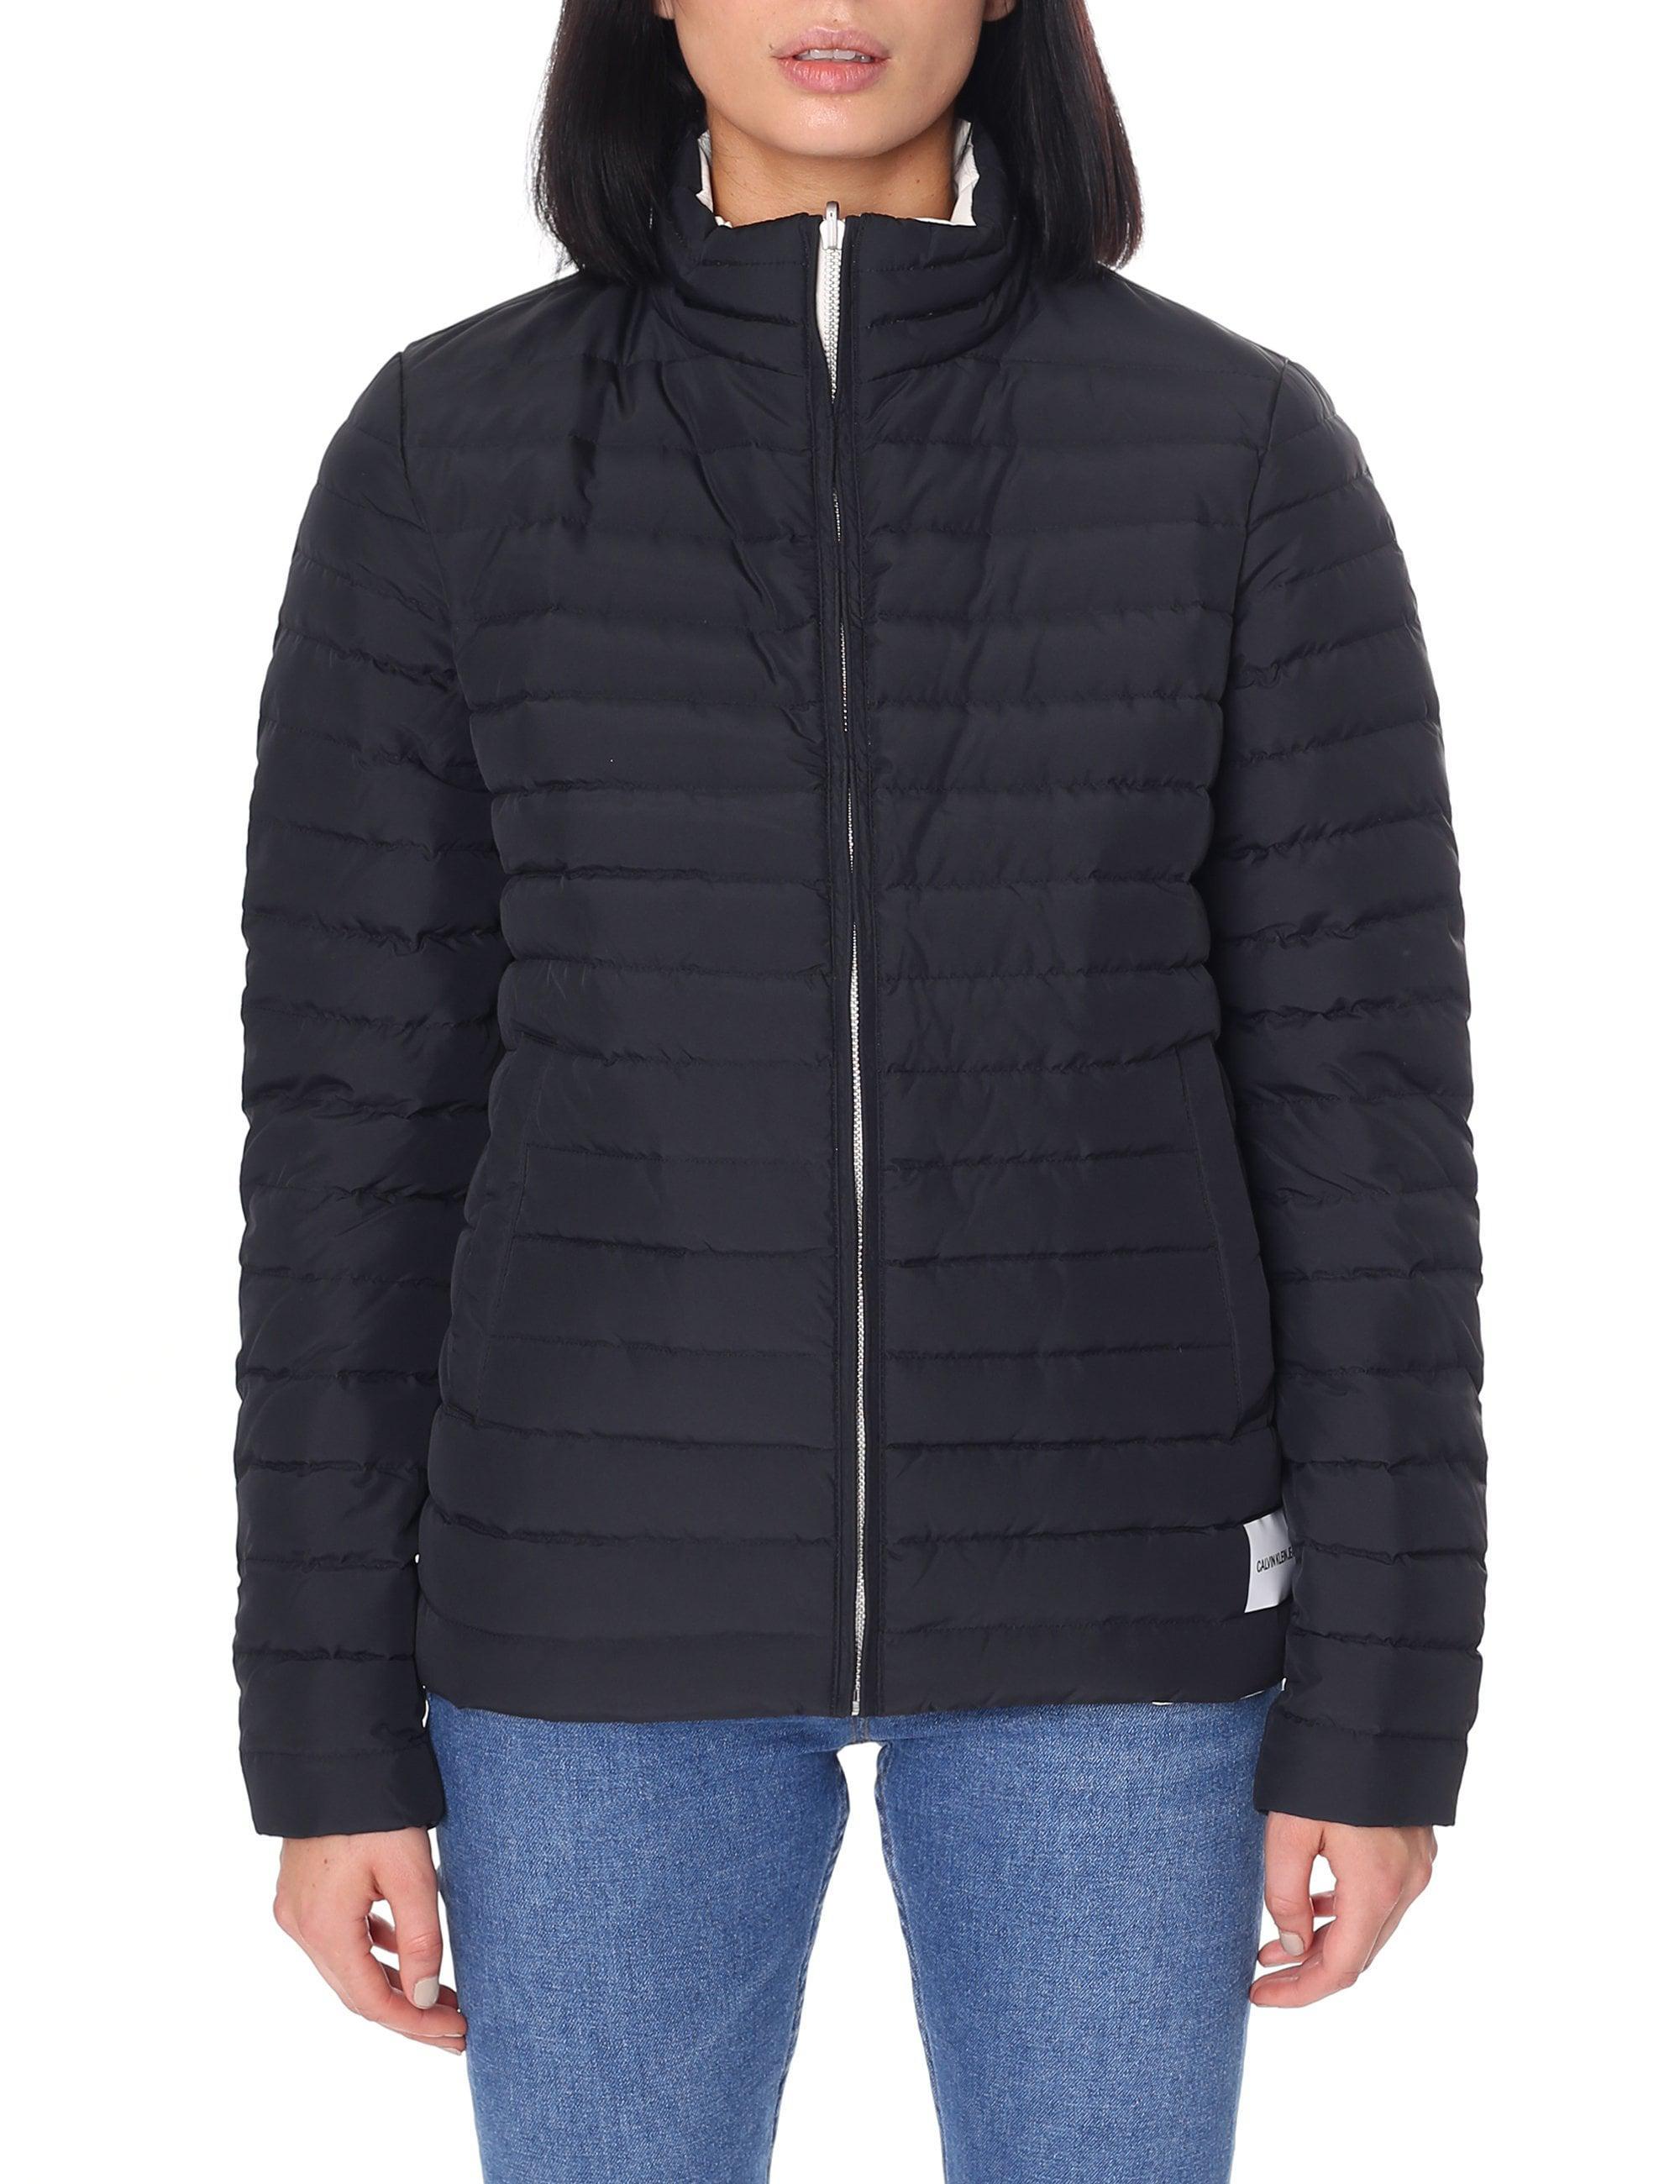 27d3ed02941 Calvin Klein Women s Reversible Puffer Jacket Ck Black egret in ...